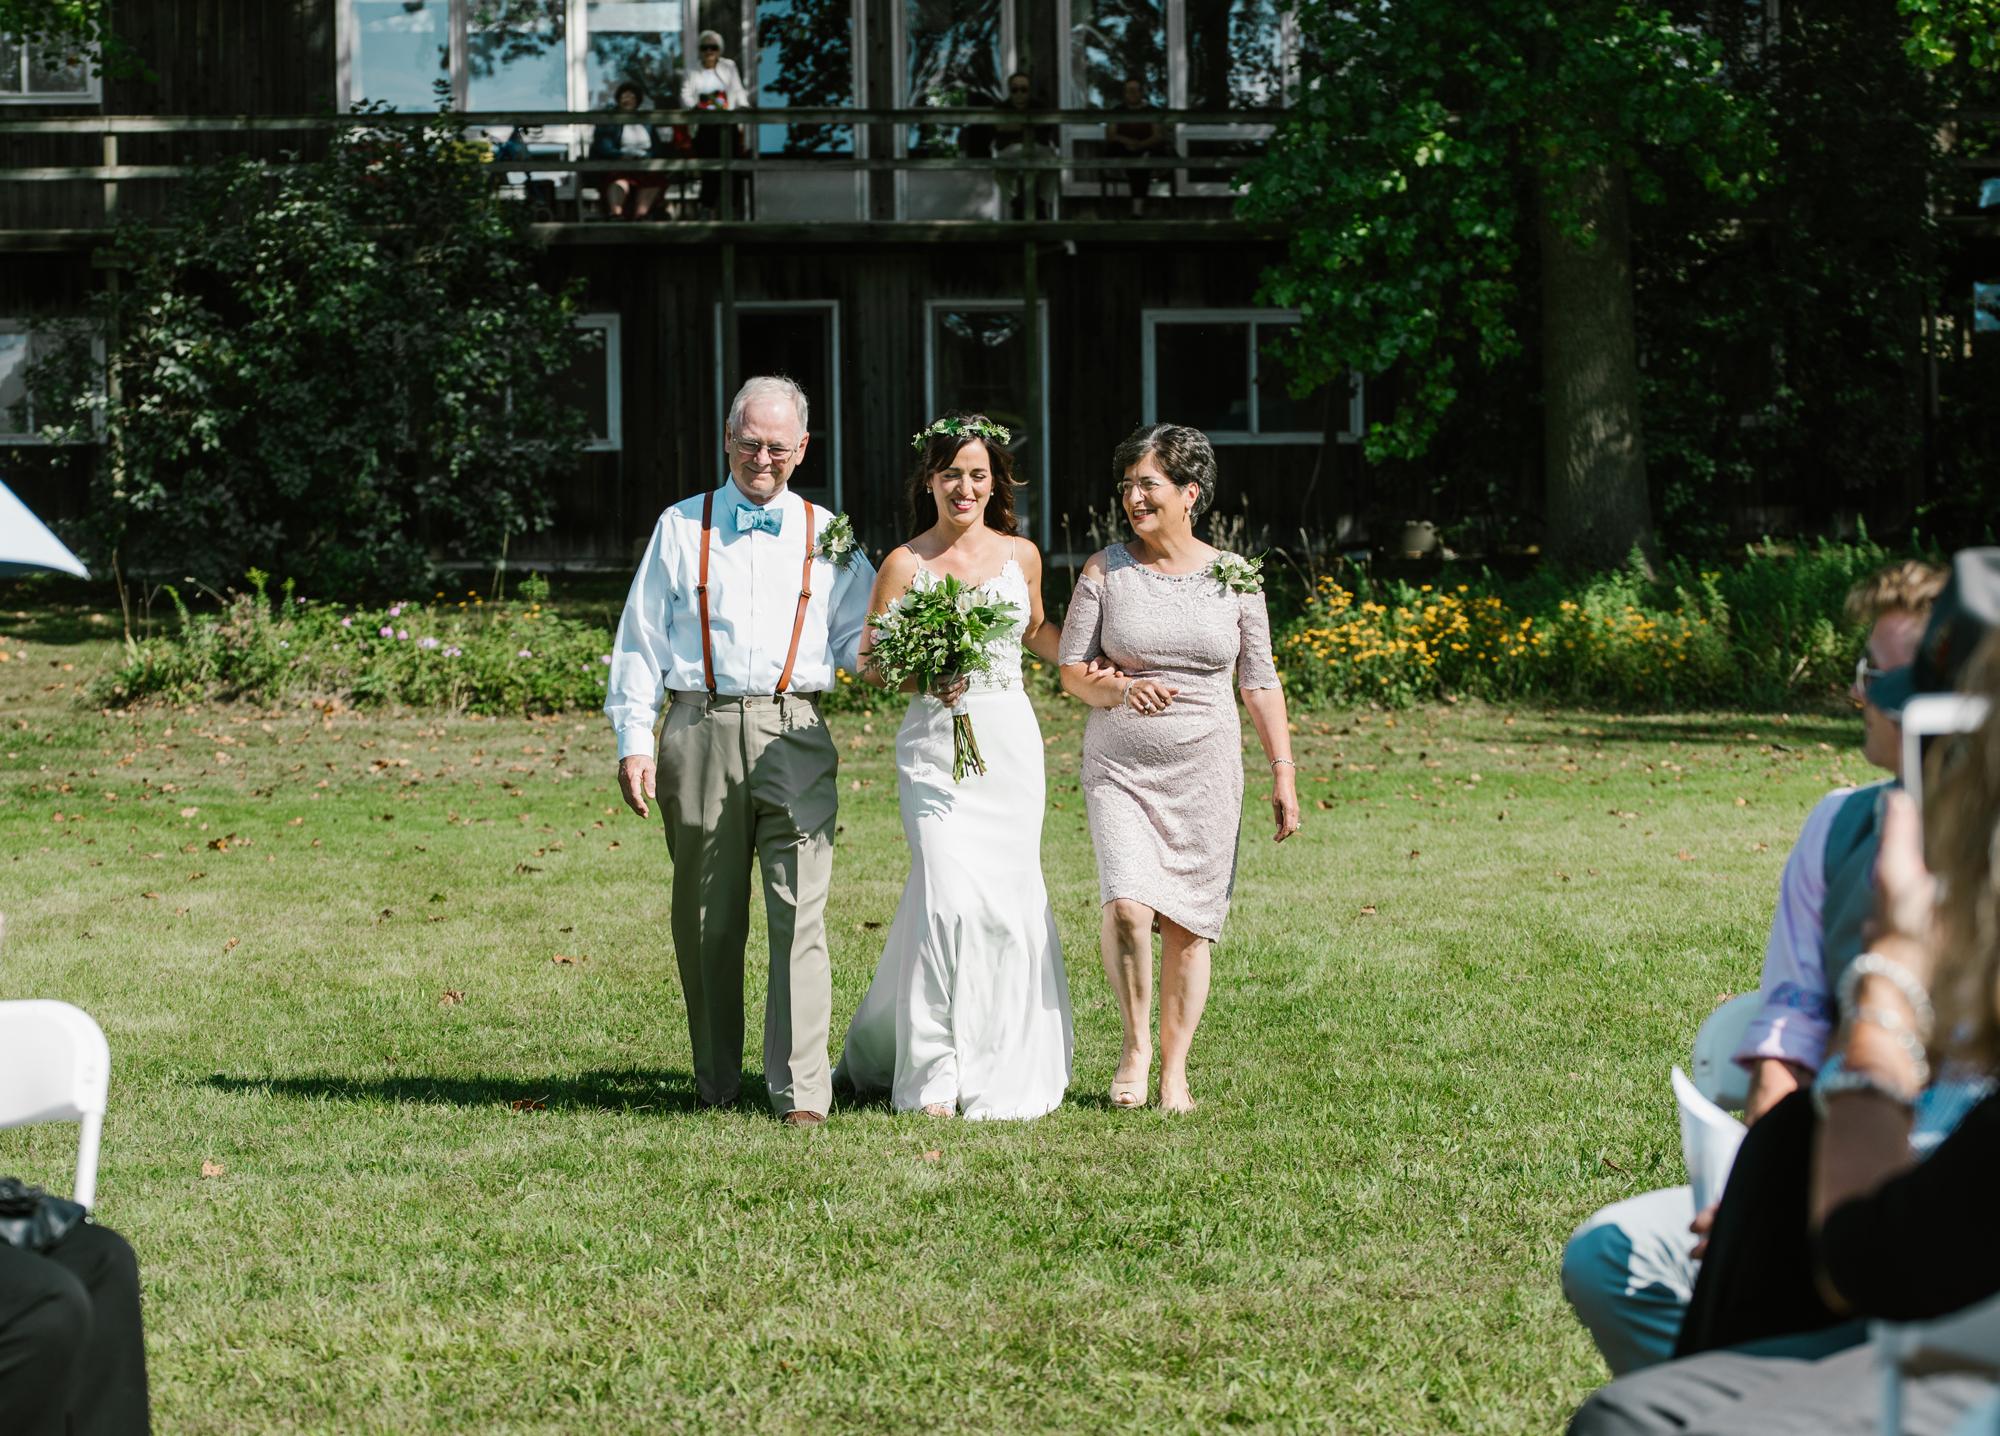 Quincy-Coldwater-Michigan-farm-wedding-photogapher-sydney-marie (84).jpg